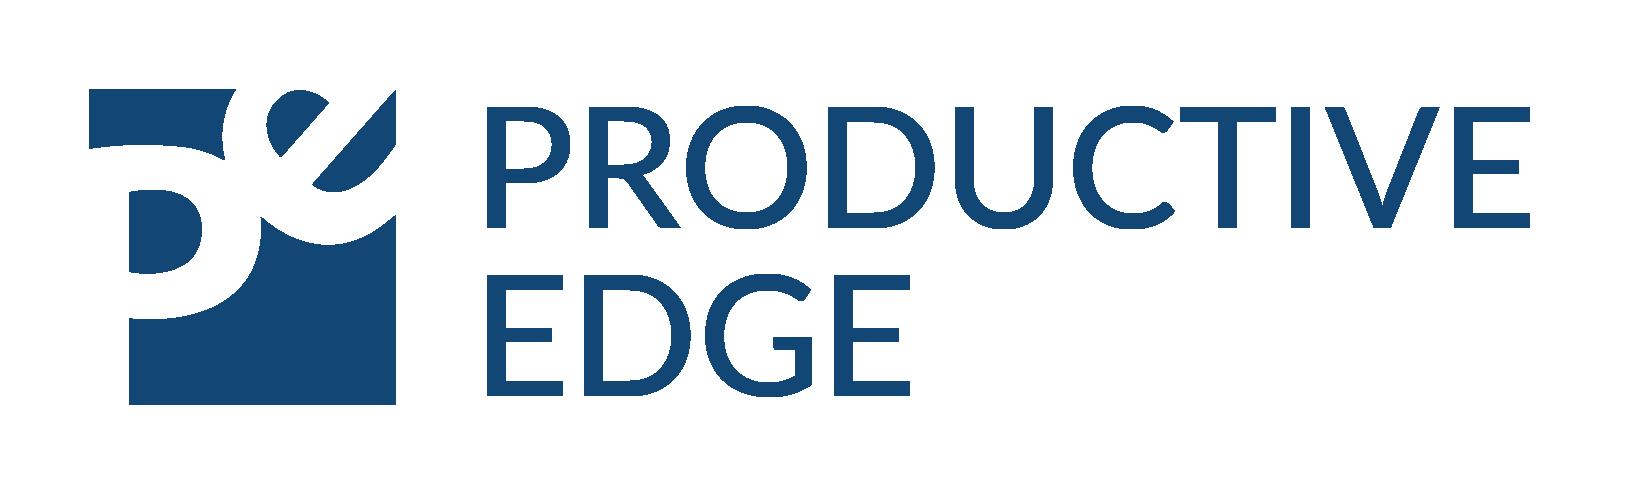 Productive Edge Logo